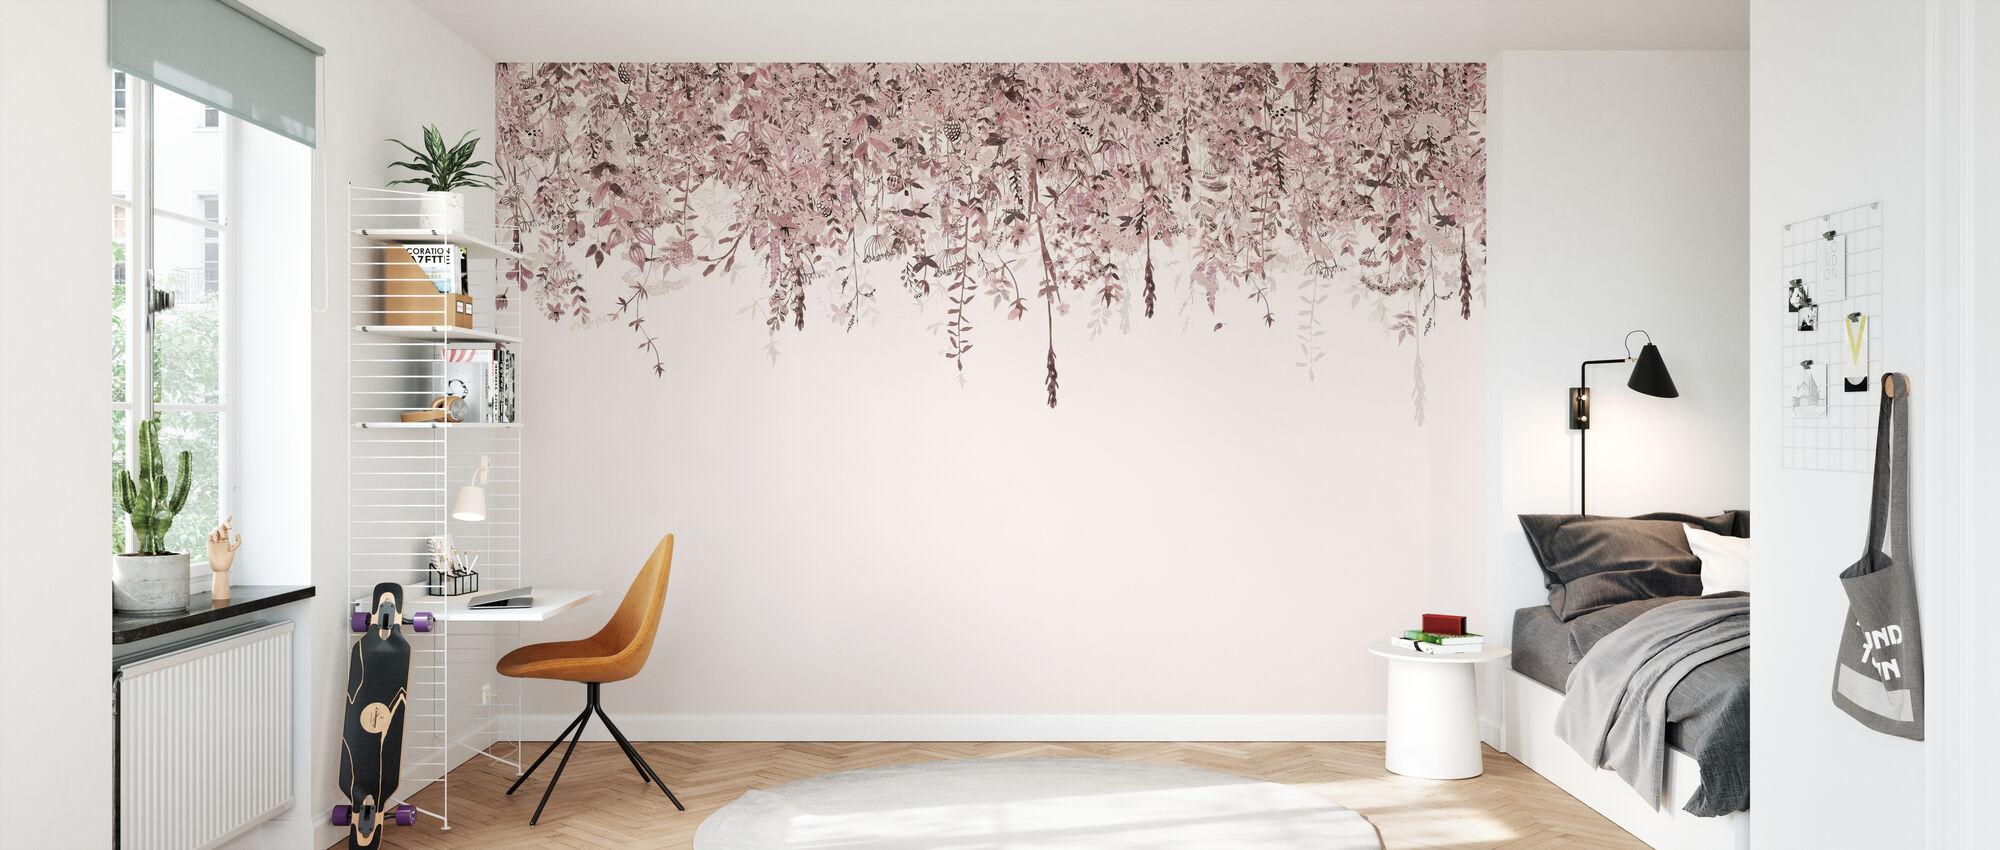 Enchanted Blush - Wallpaper - Kids Room